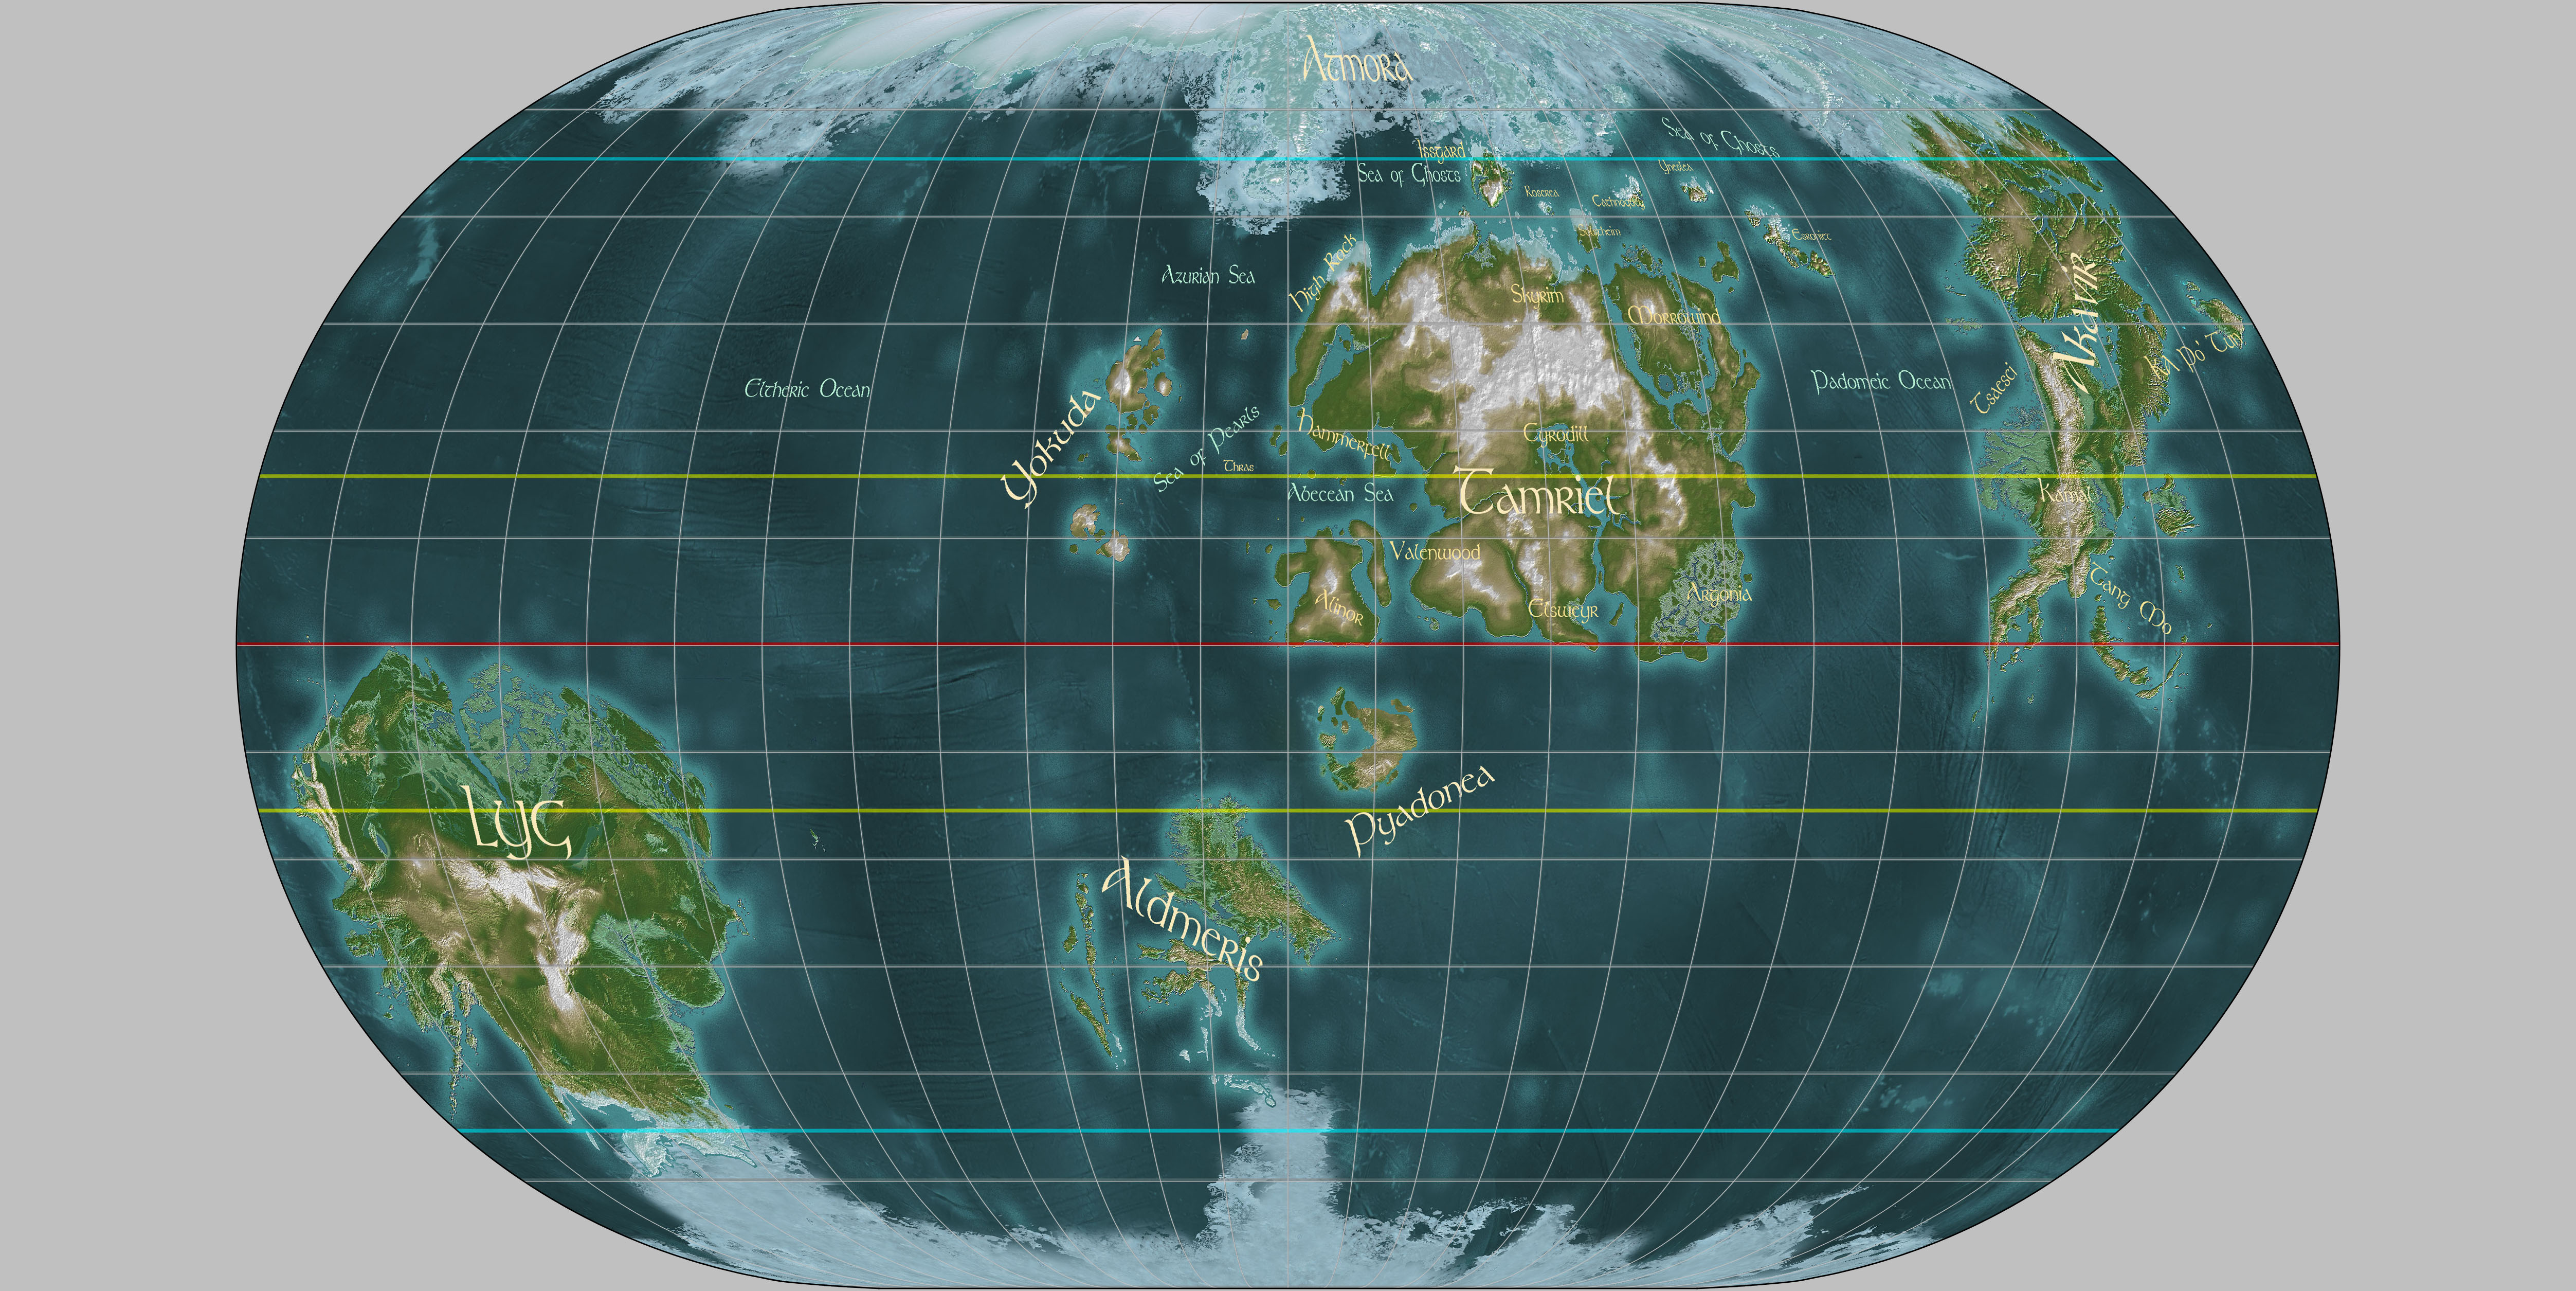 Marvelous Nirn World Map Equidistant Projection